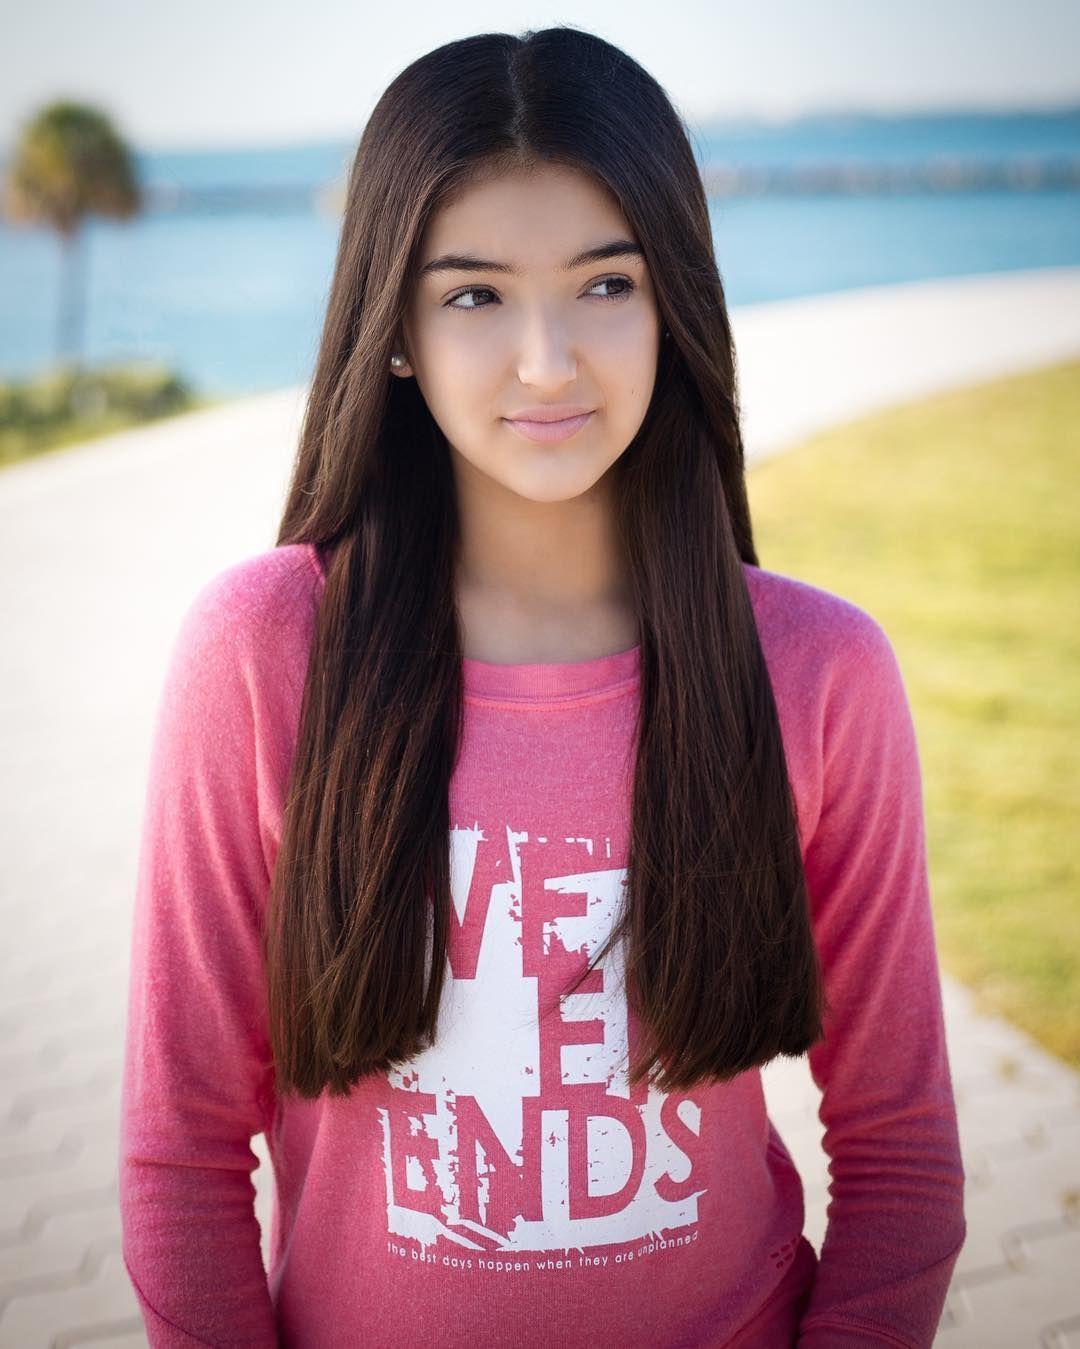 Latin teen girl model